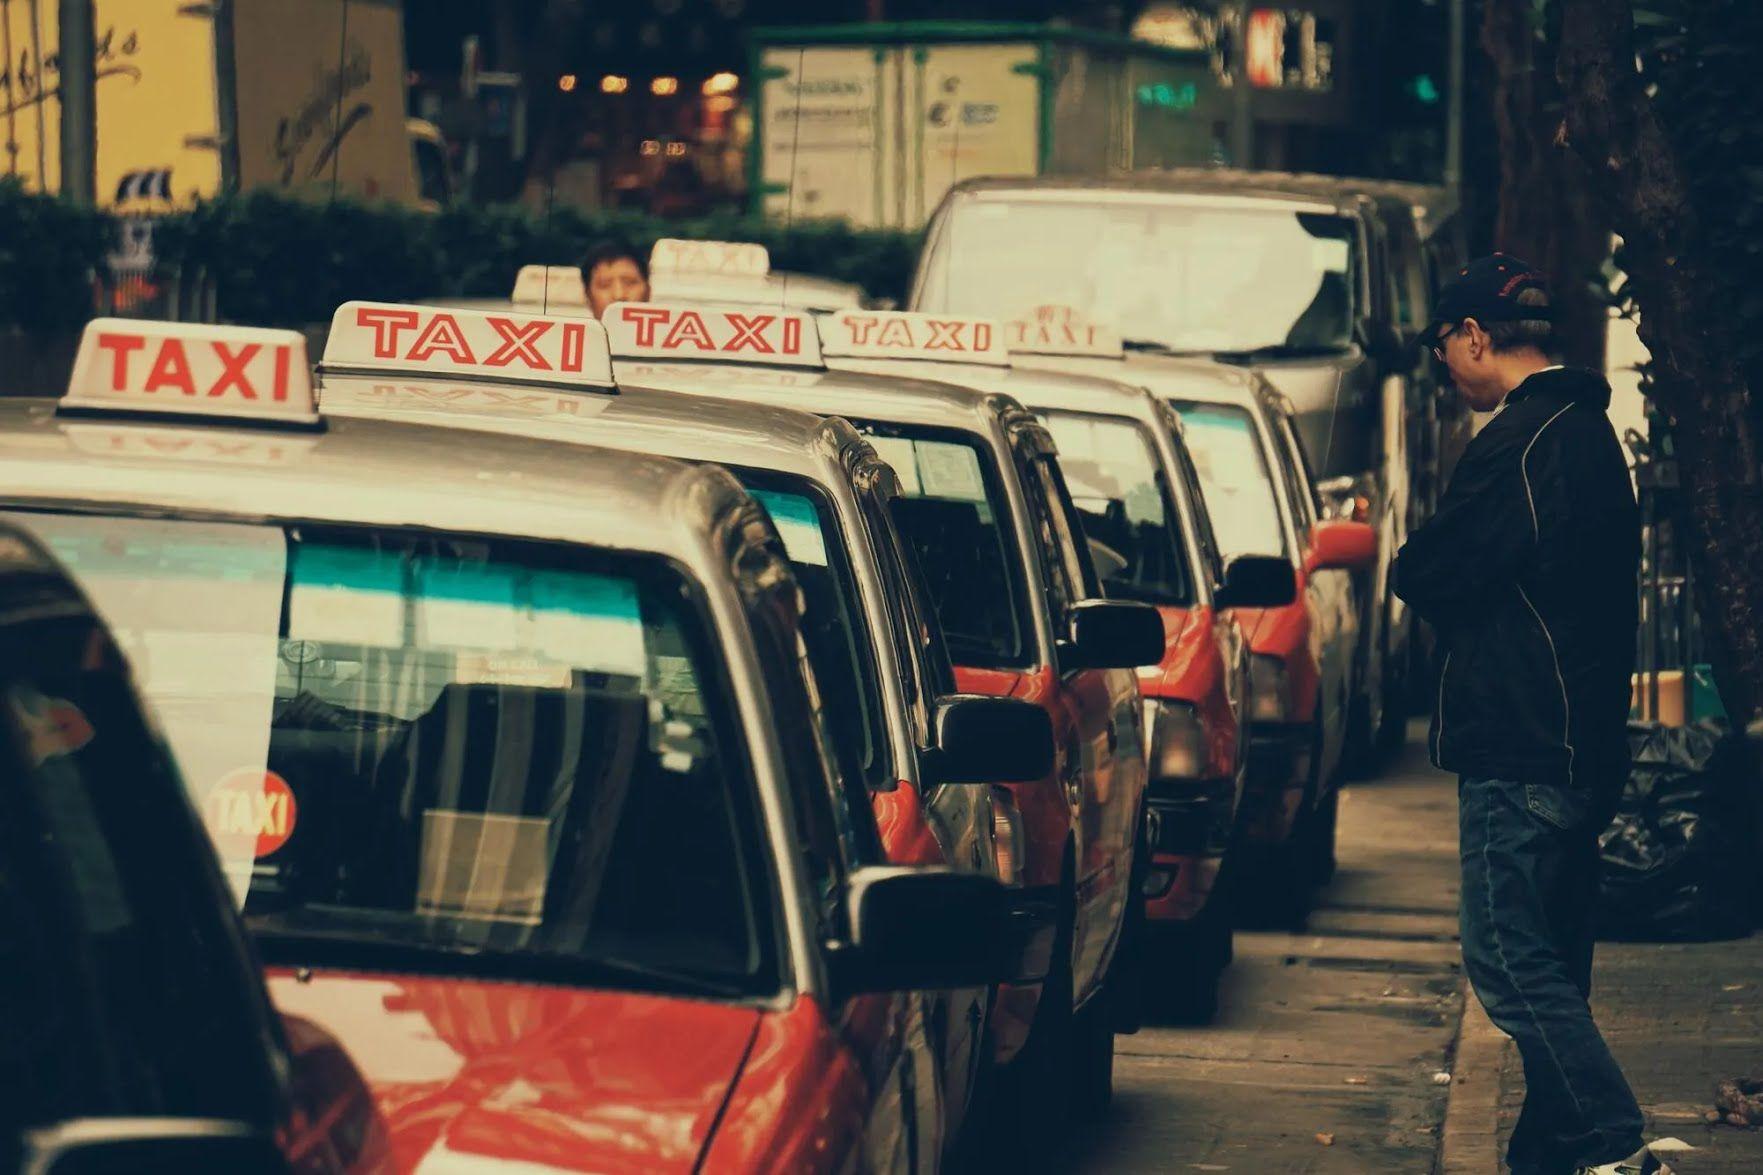 В стране запрещено парковаться на территории для такси